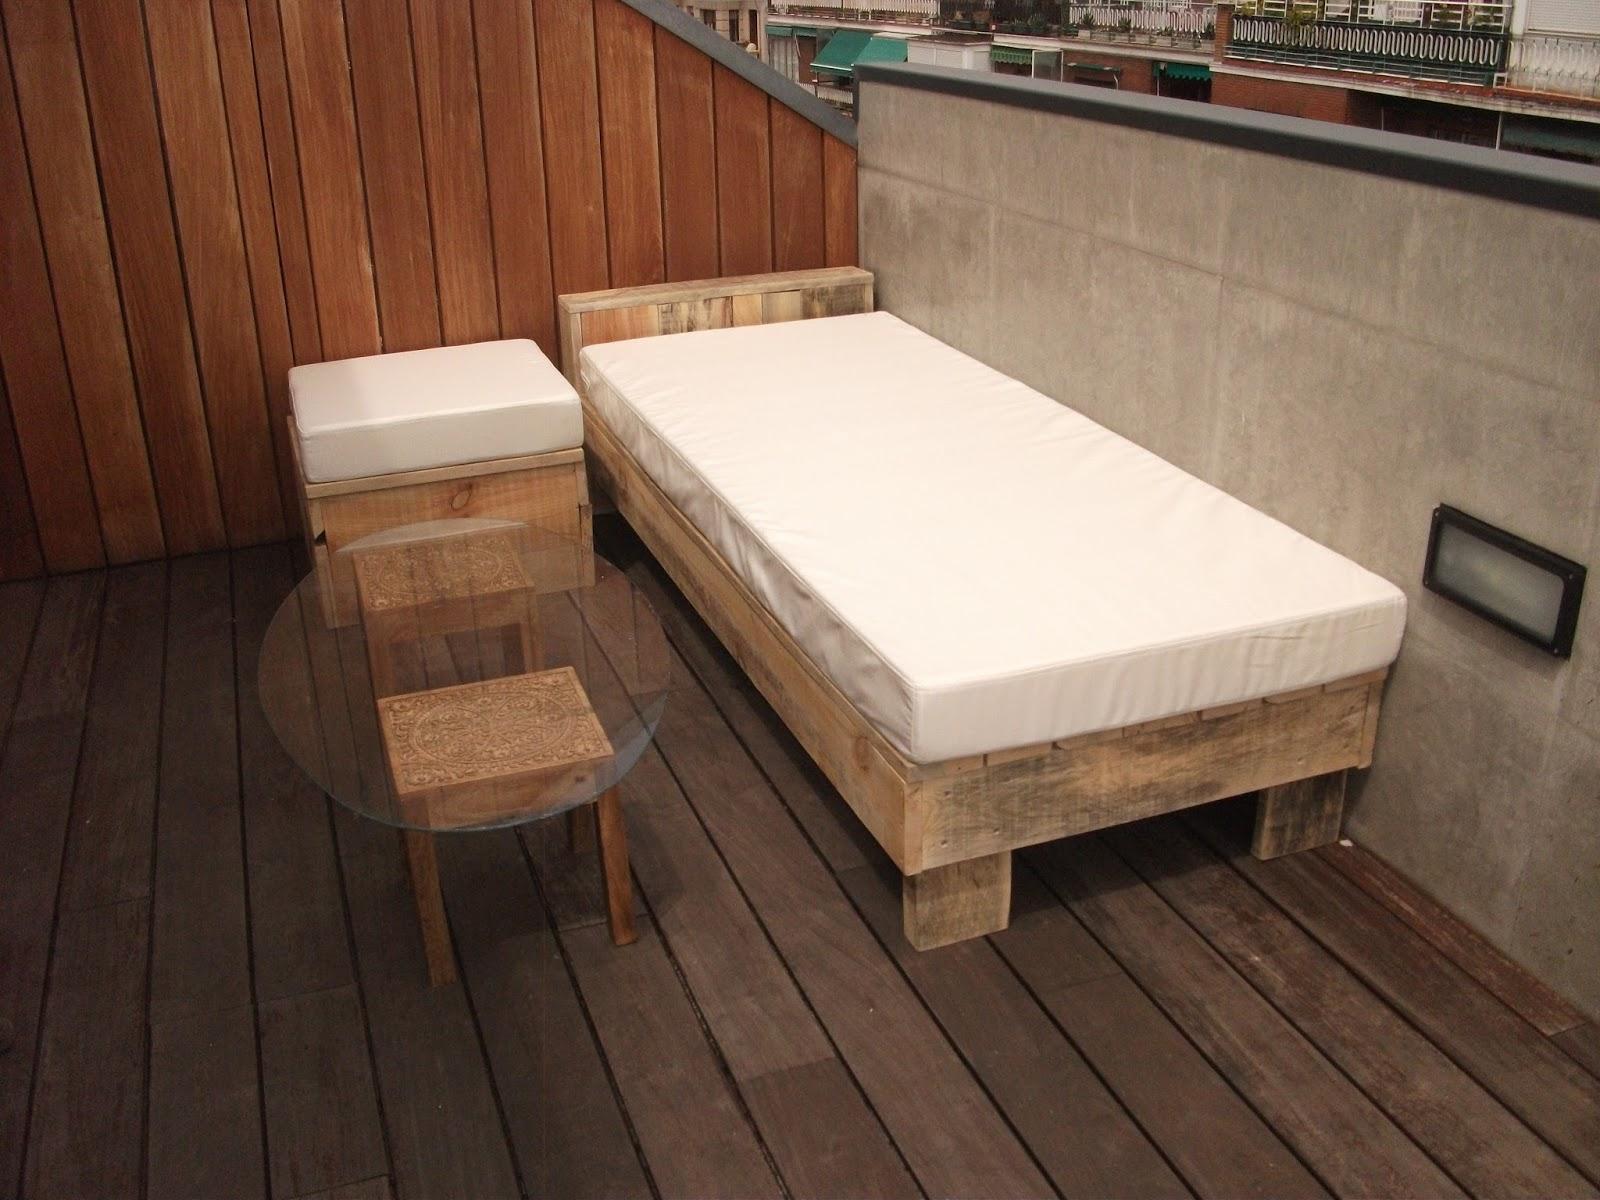 Renovarte con palets cama balinesa tatami banco balines for Cama 80x180